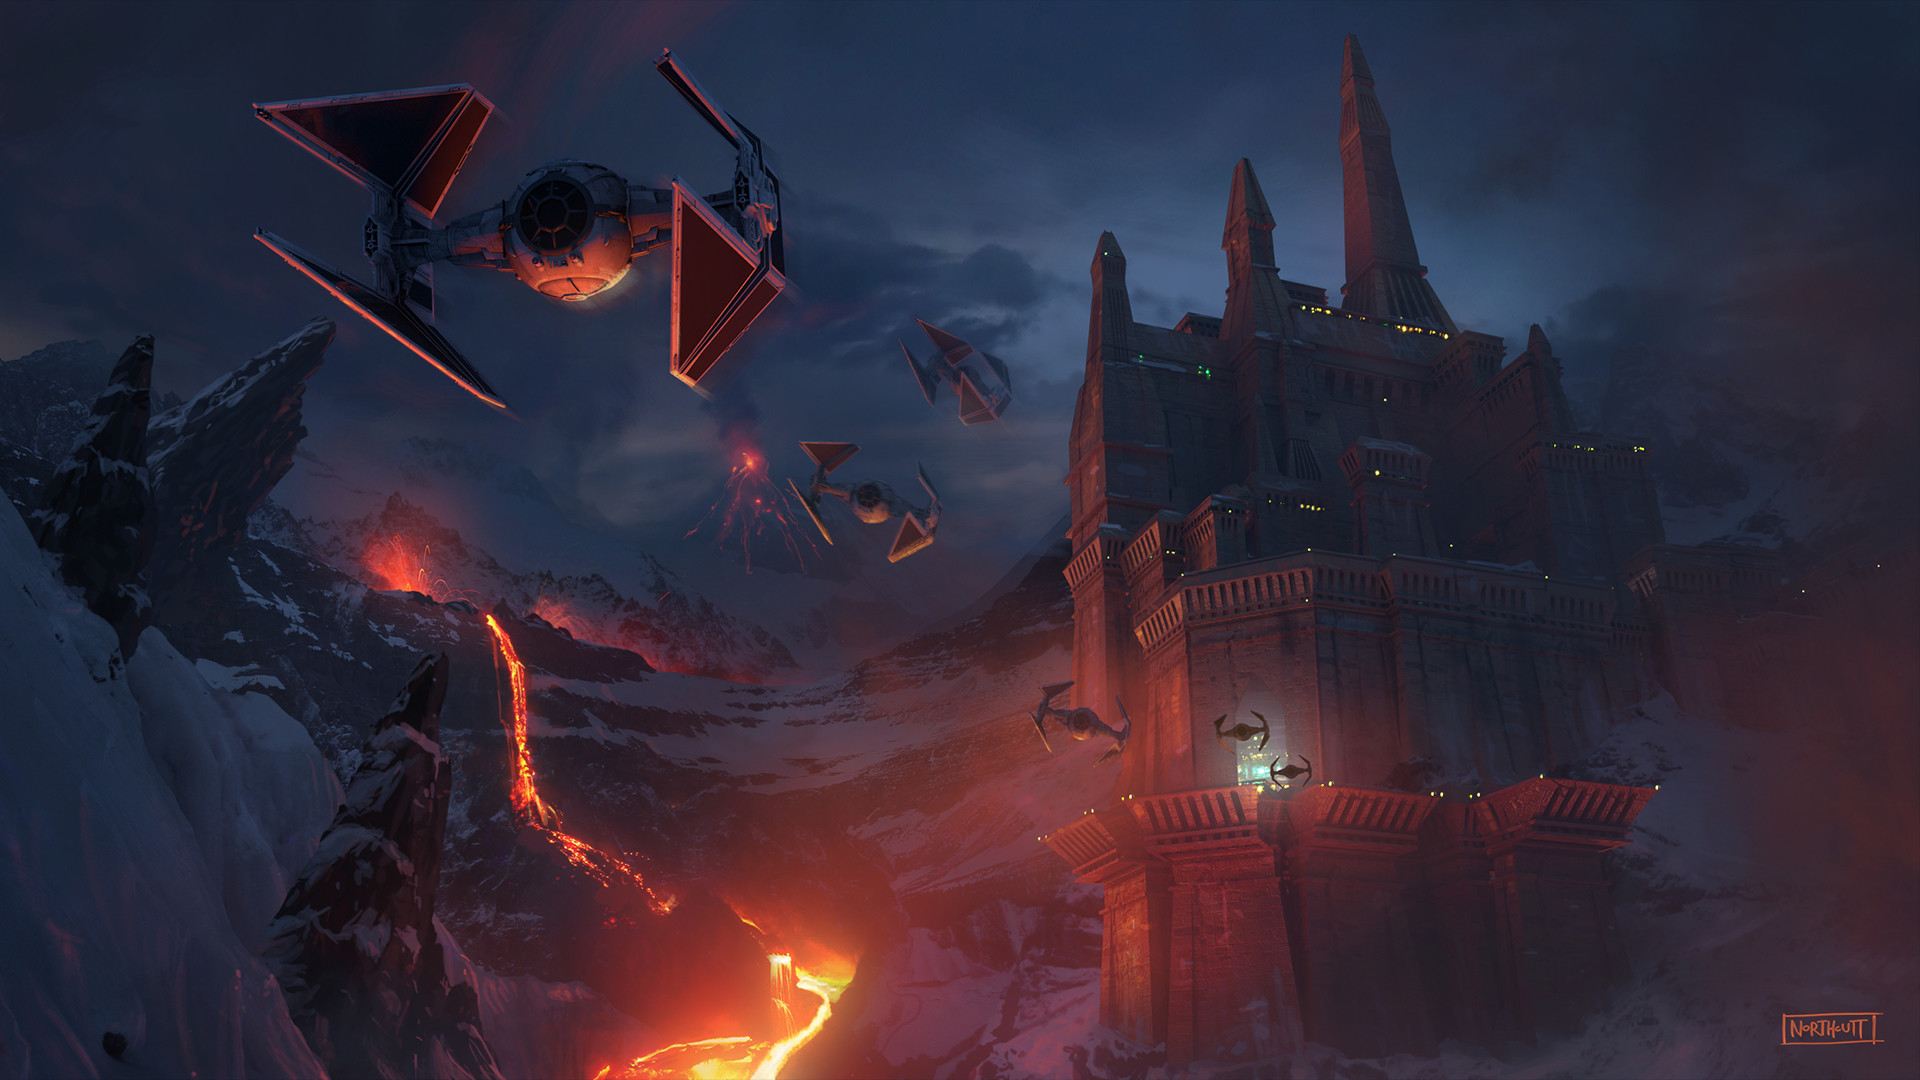 star-wars-the-force-awakens-concept-art-ilm-